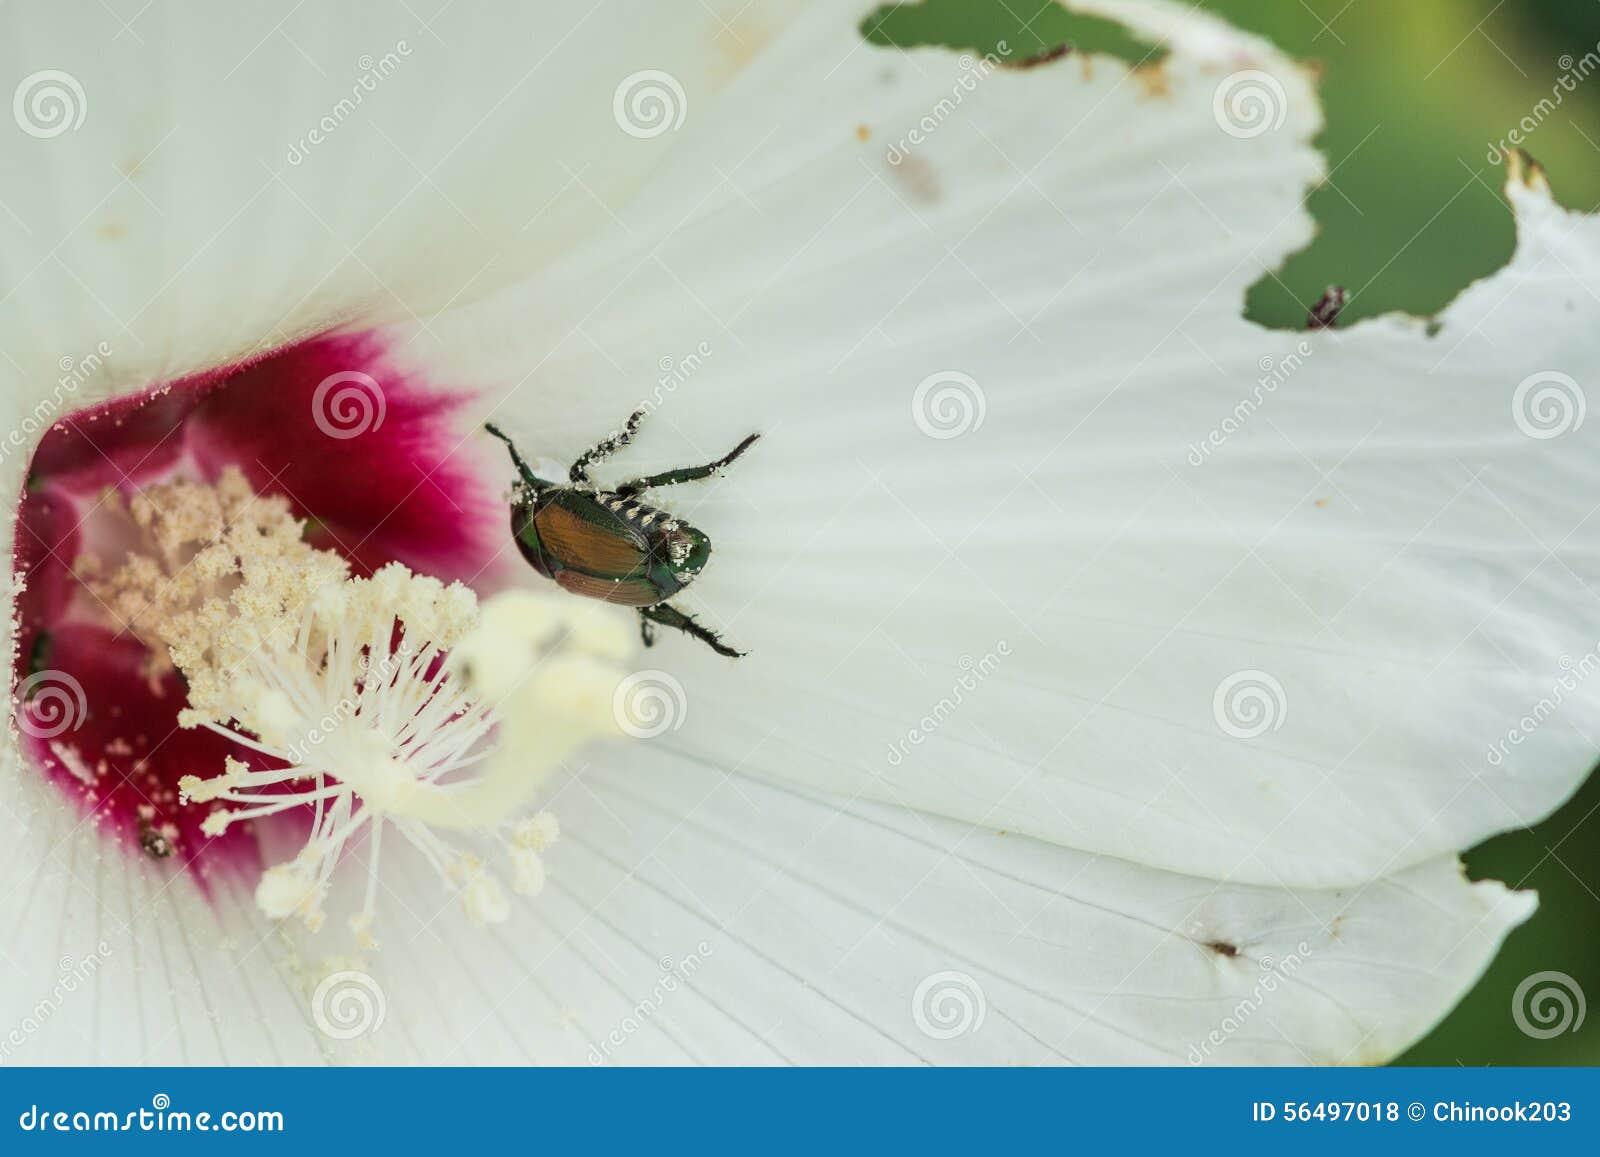 Japanese Beetle On A Hibiscus Flower Stock Photo Image Of Popillia